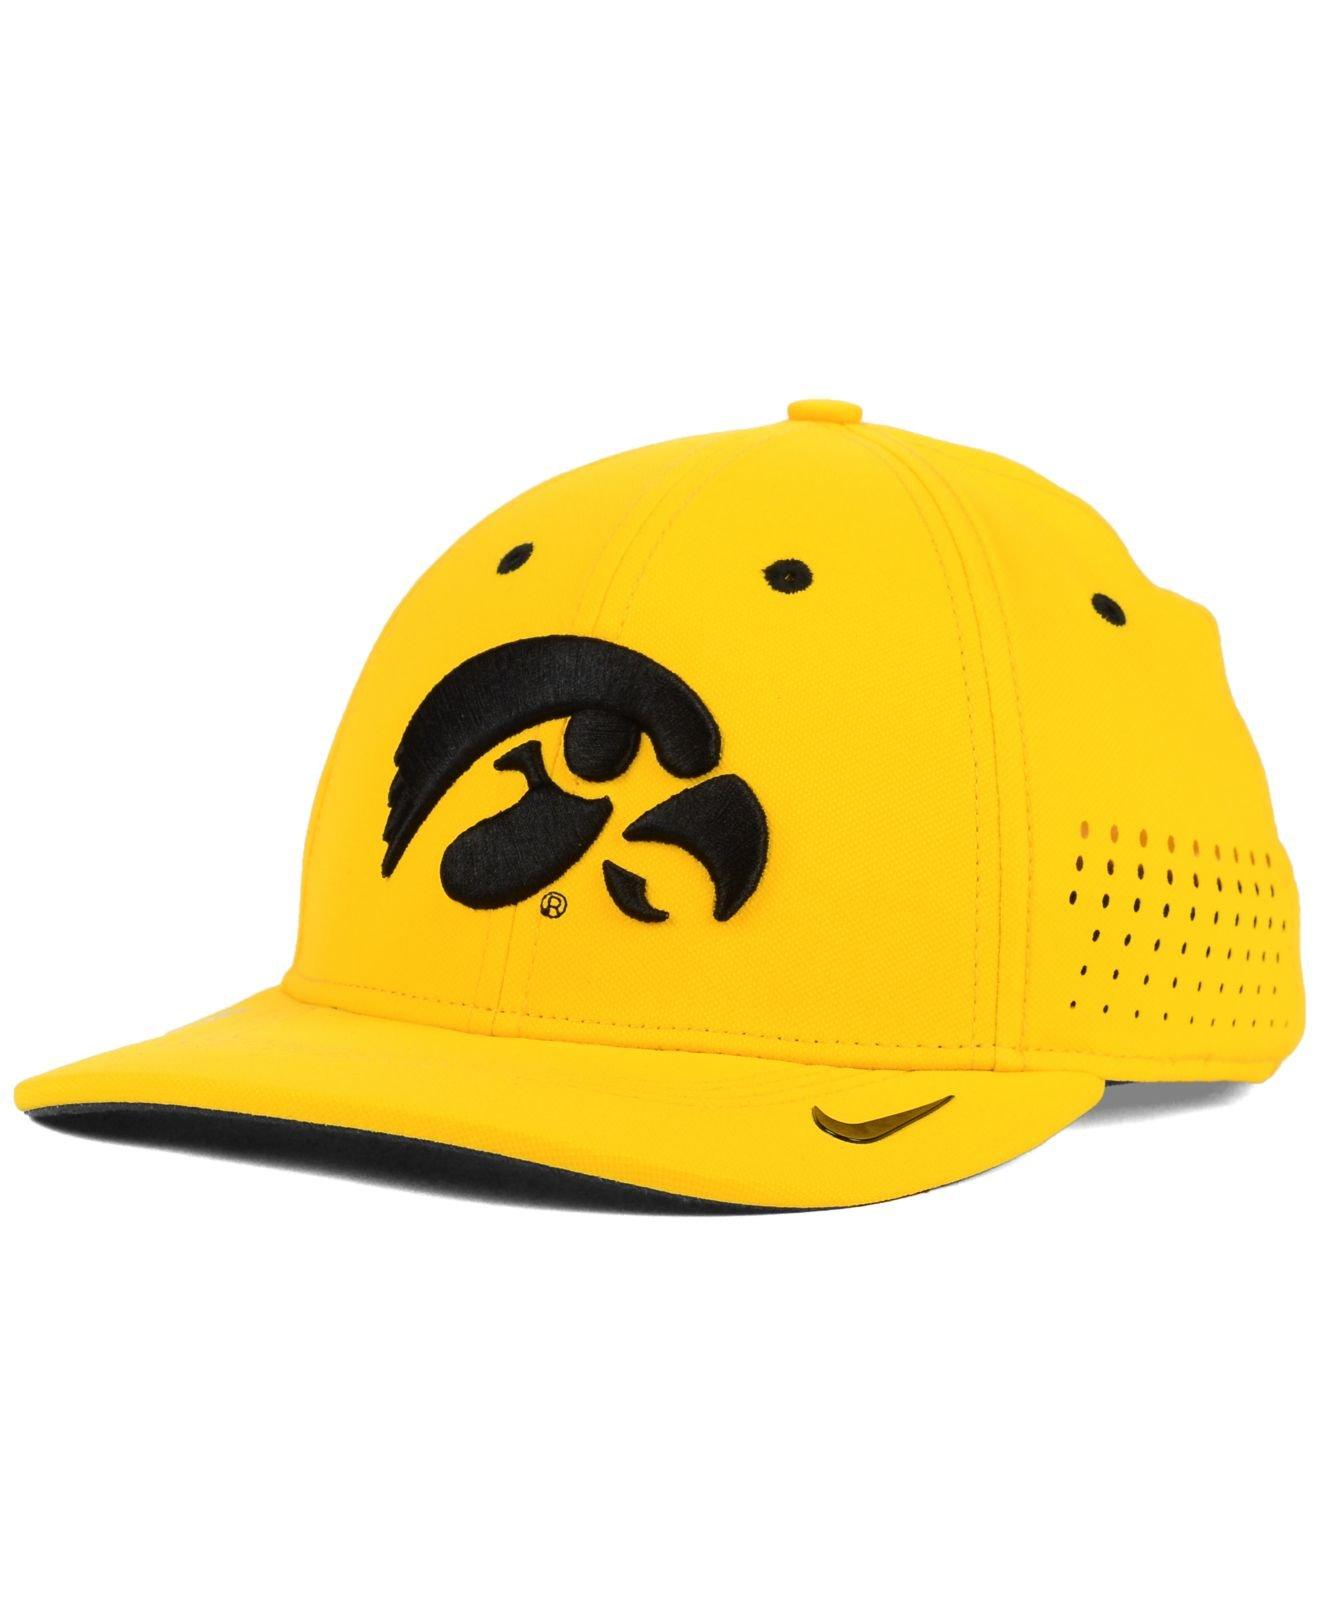 7129623b3 Nike Yellow Iowa Hawkeyes Sideline Cap for men